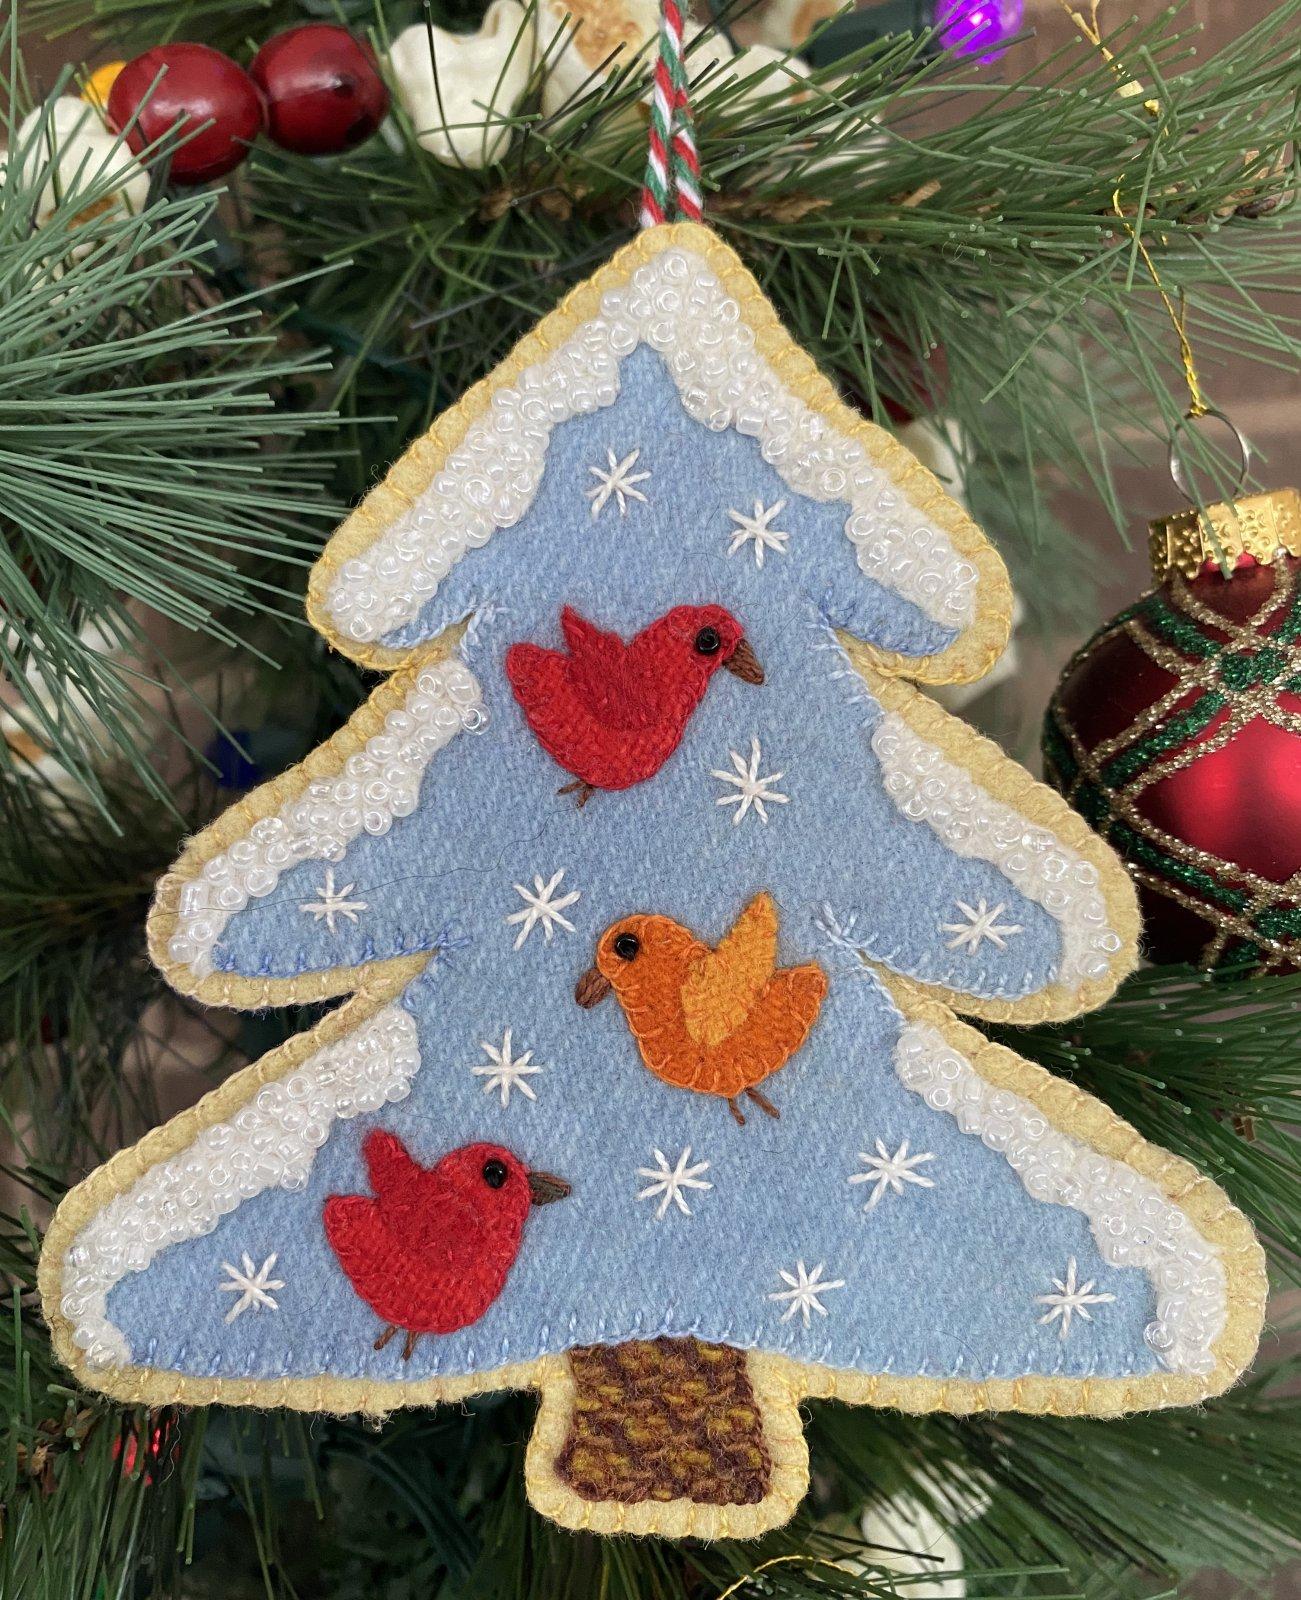 Sugar Plum Parrish Songbird Christmas Tree Ornament Download